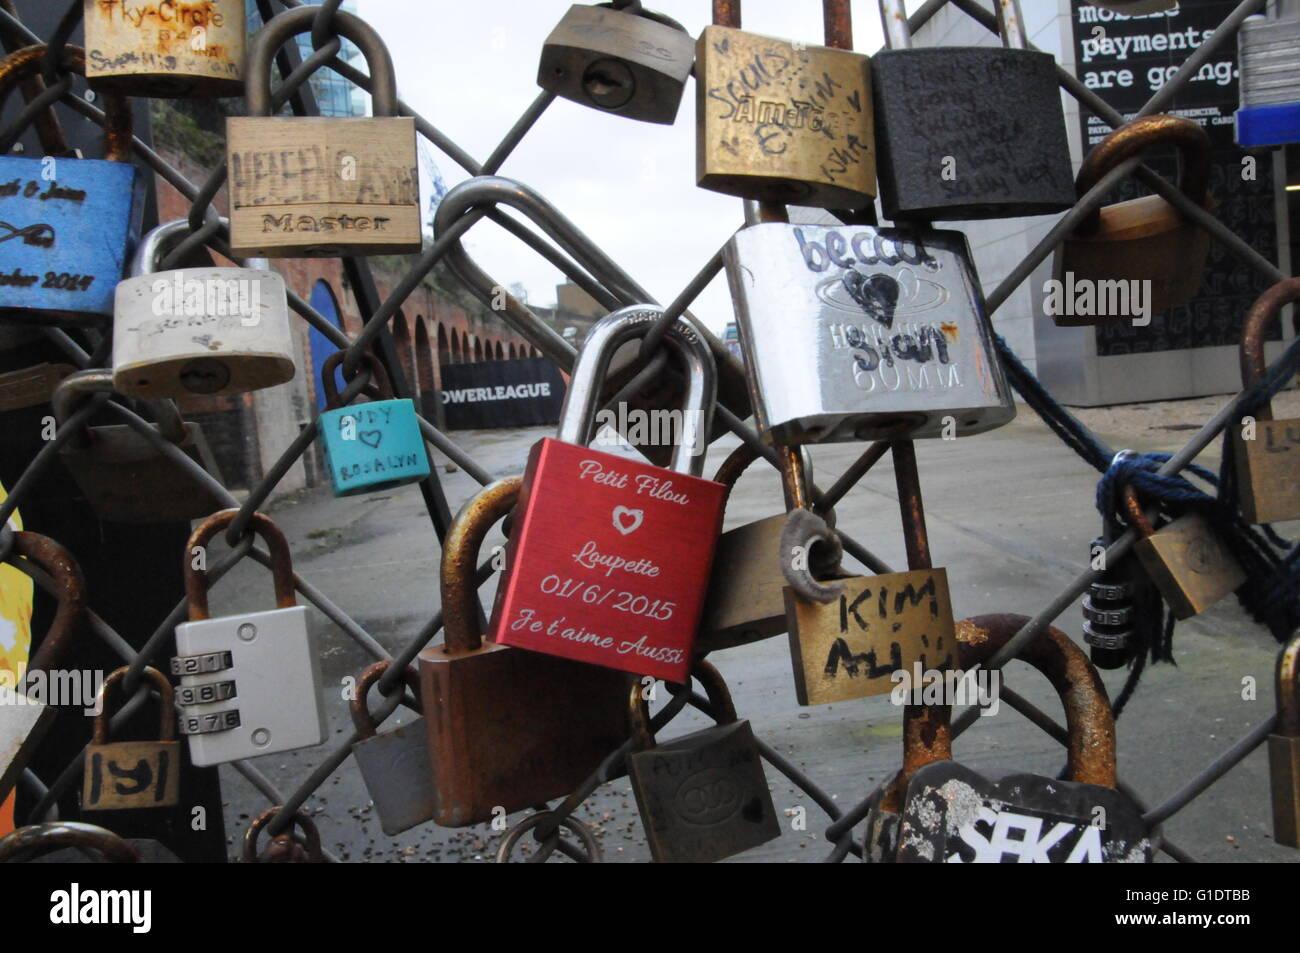 Love locks in Shoreditch, East London, UK - Stock Image